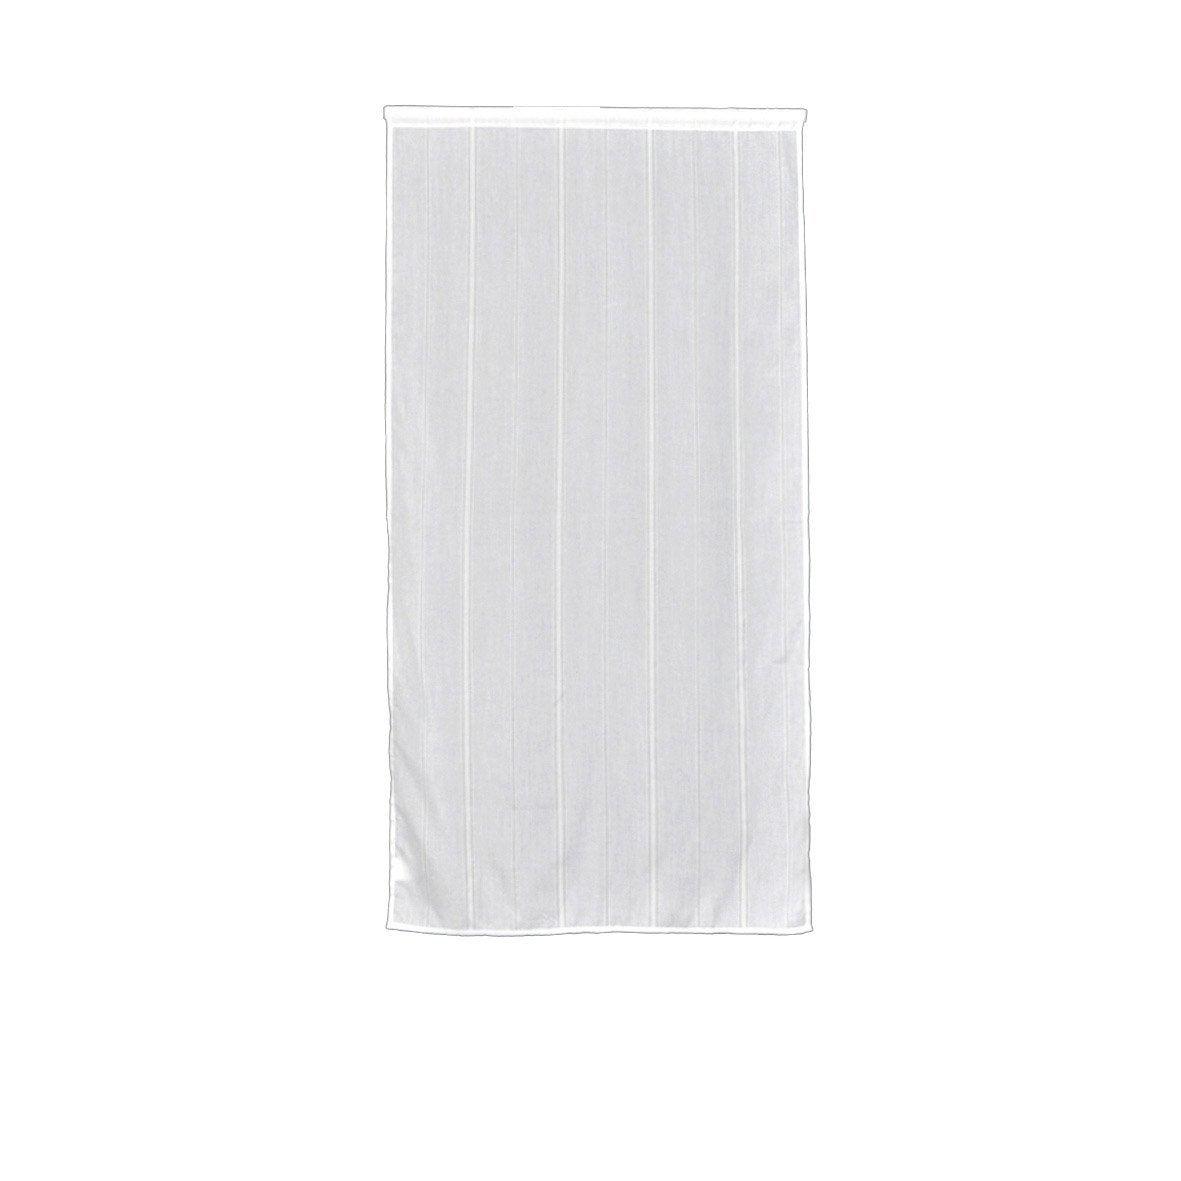 Vitrage capucine blanc 90 x 160 cm leroy merlin - Leroy merlin vitrage ...